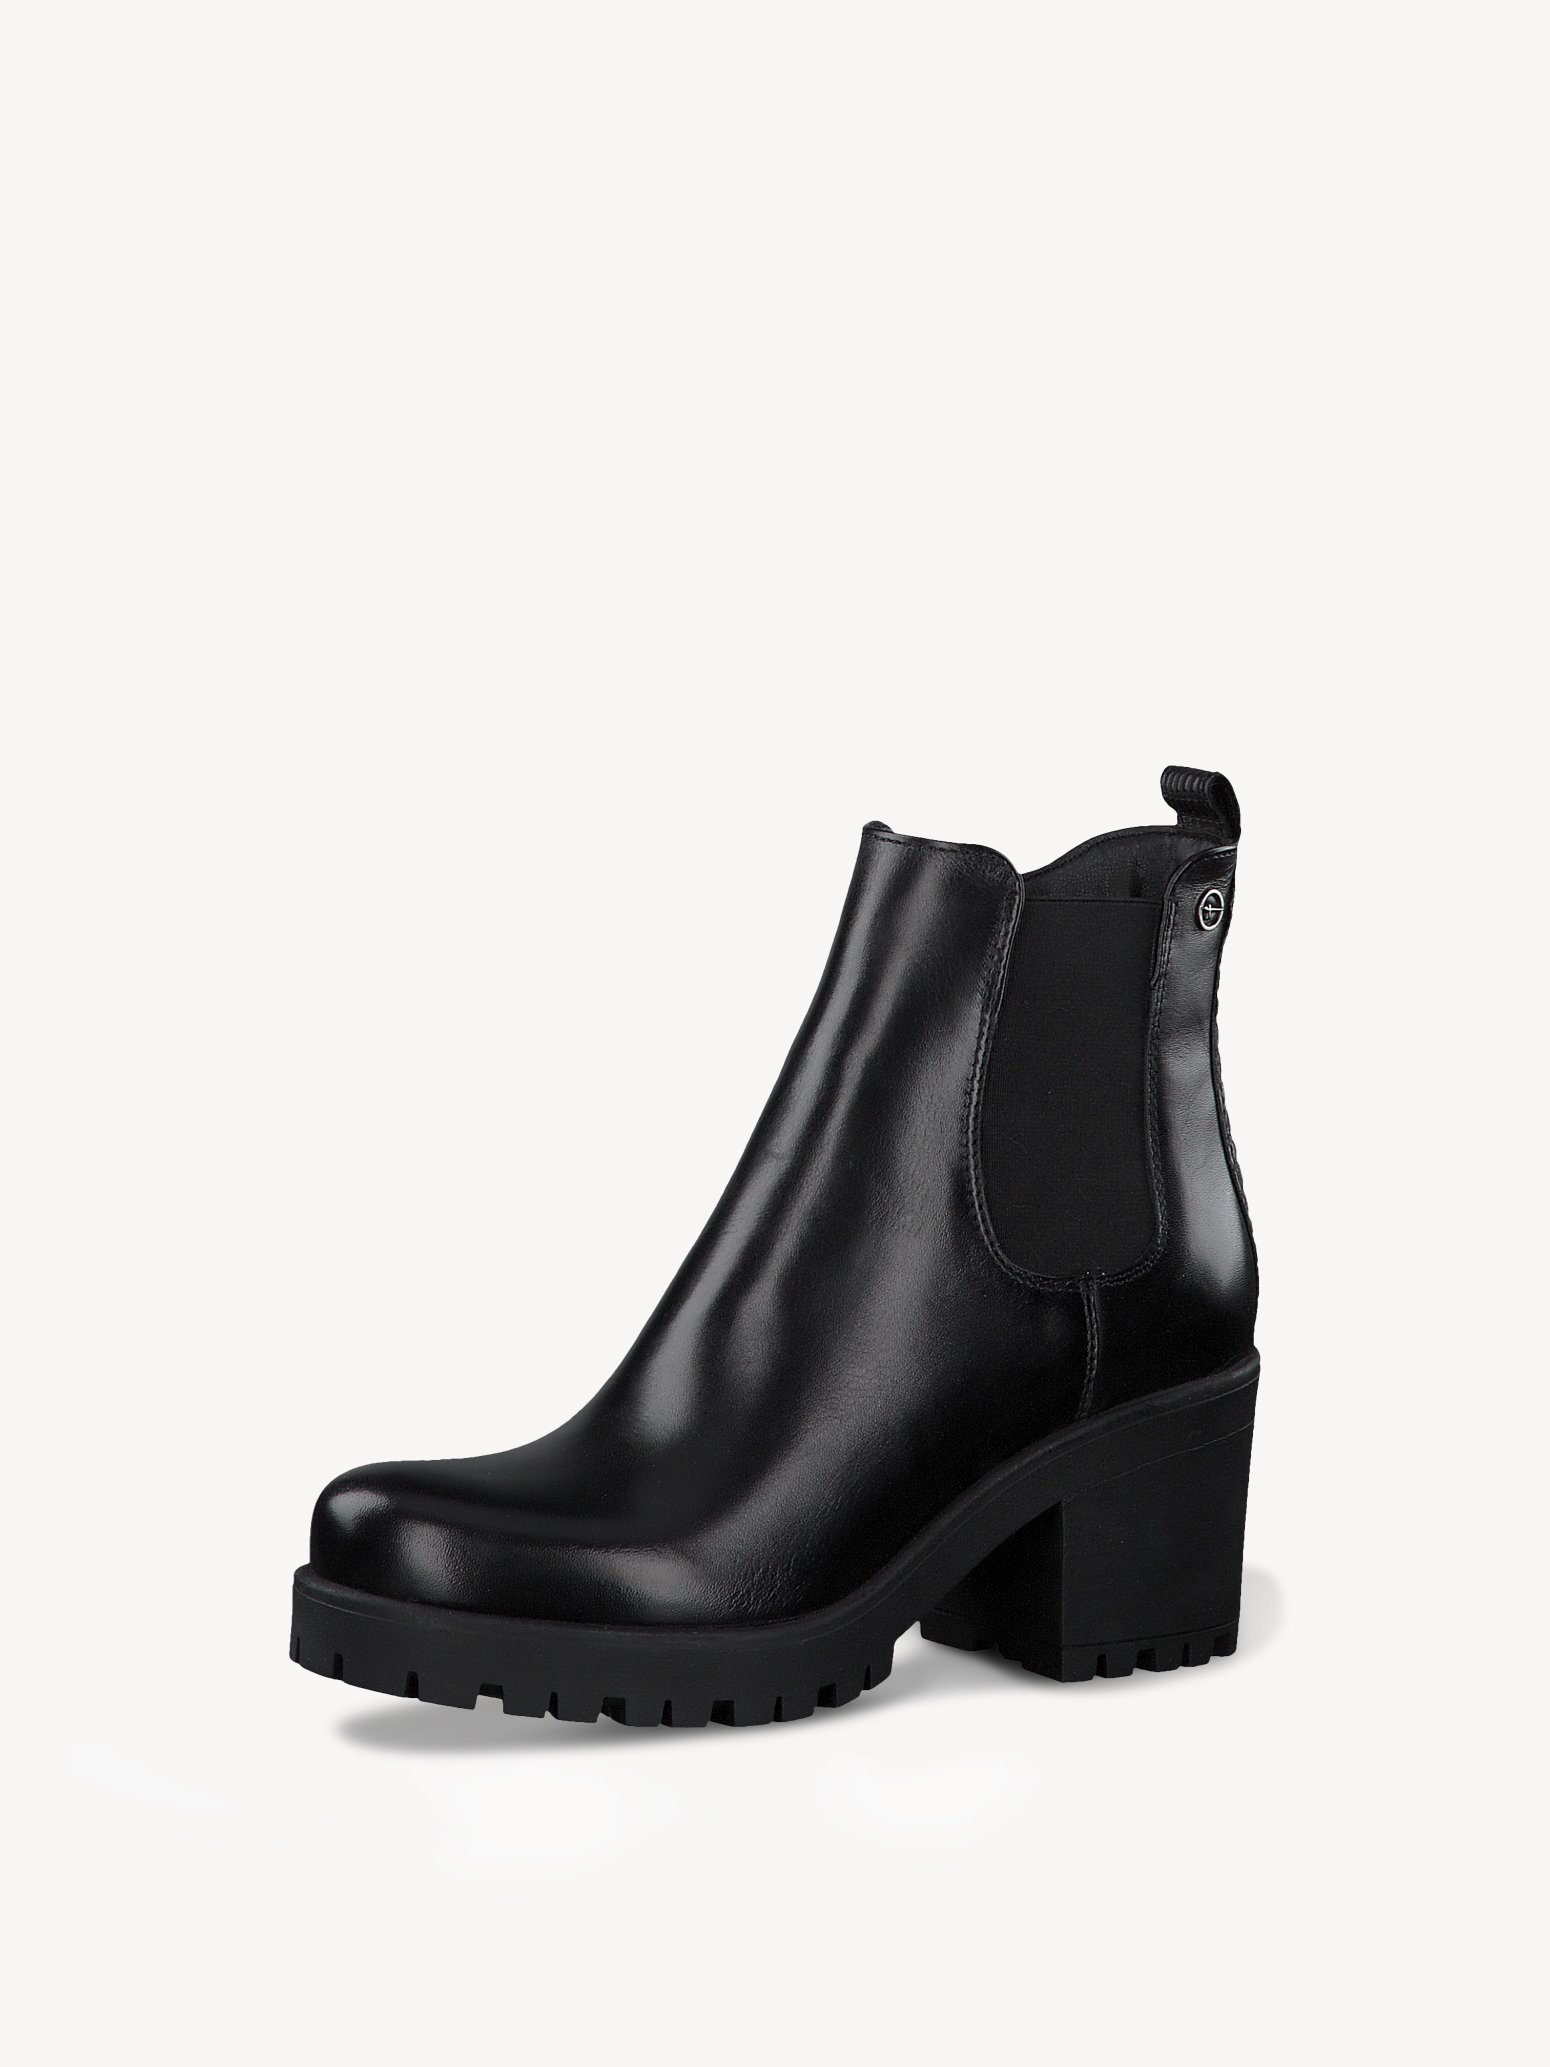 Ботинки Tamaris 1-1-25464-25-021